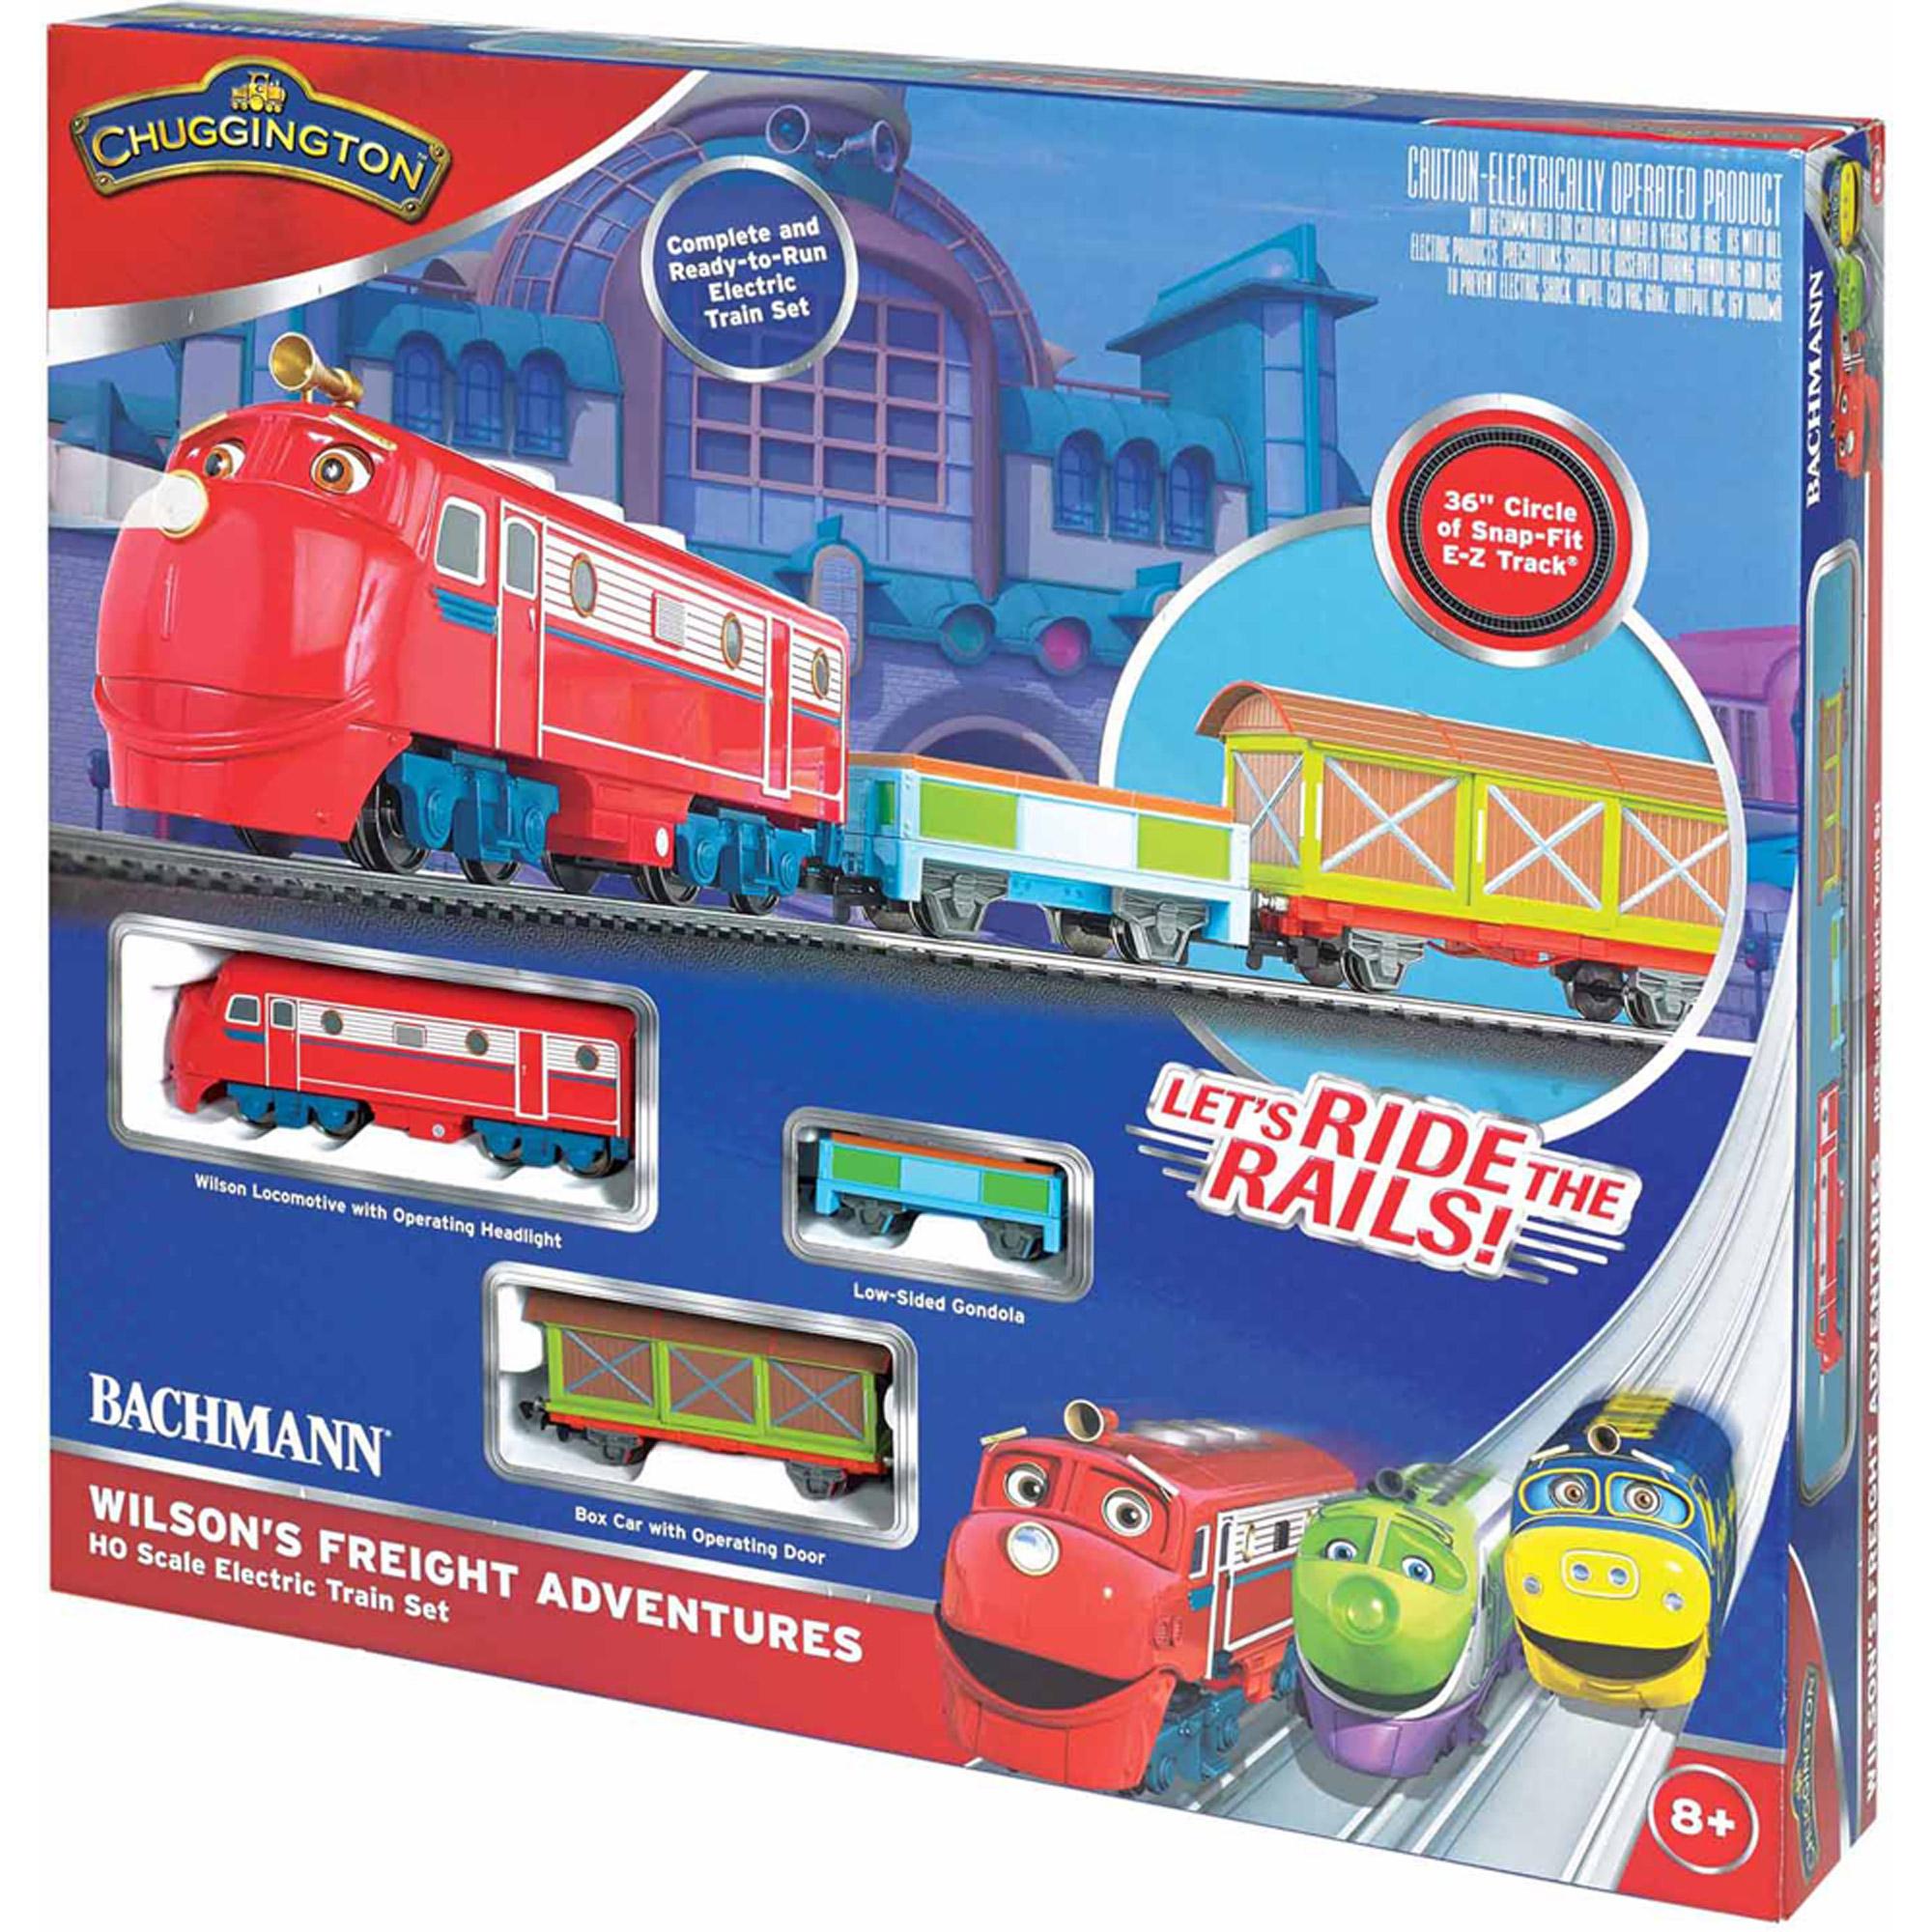 Bachmann Trains Chuggington Wilson's Freight Adventures, HO Scale Ready-to-Run Electric Train Set